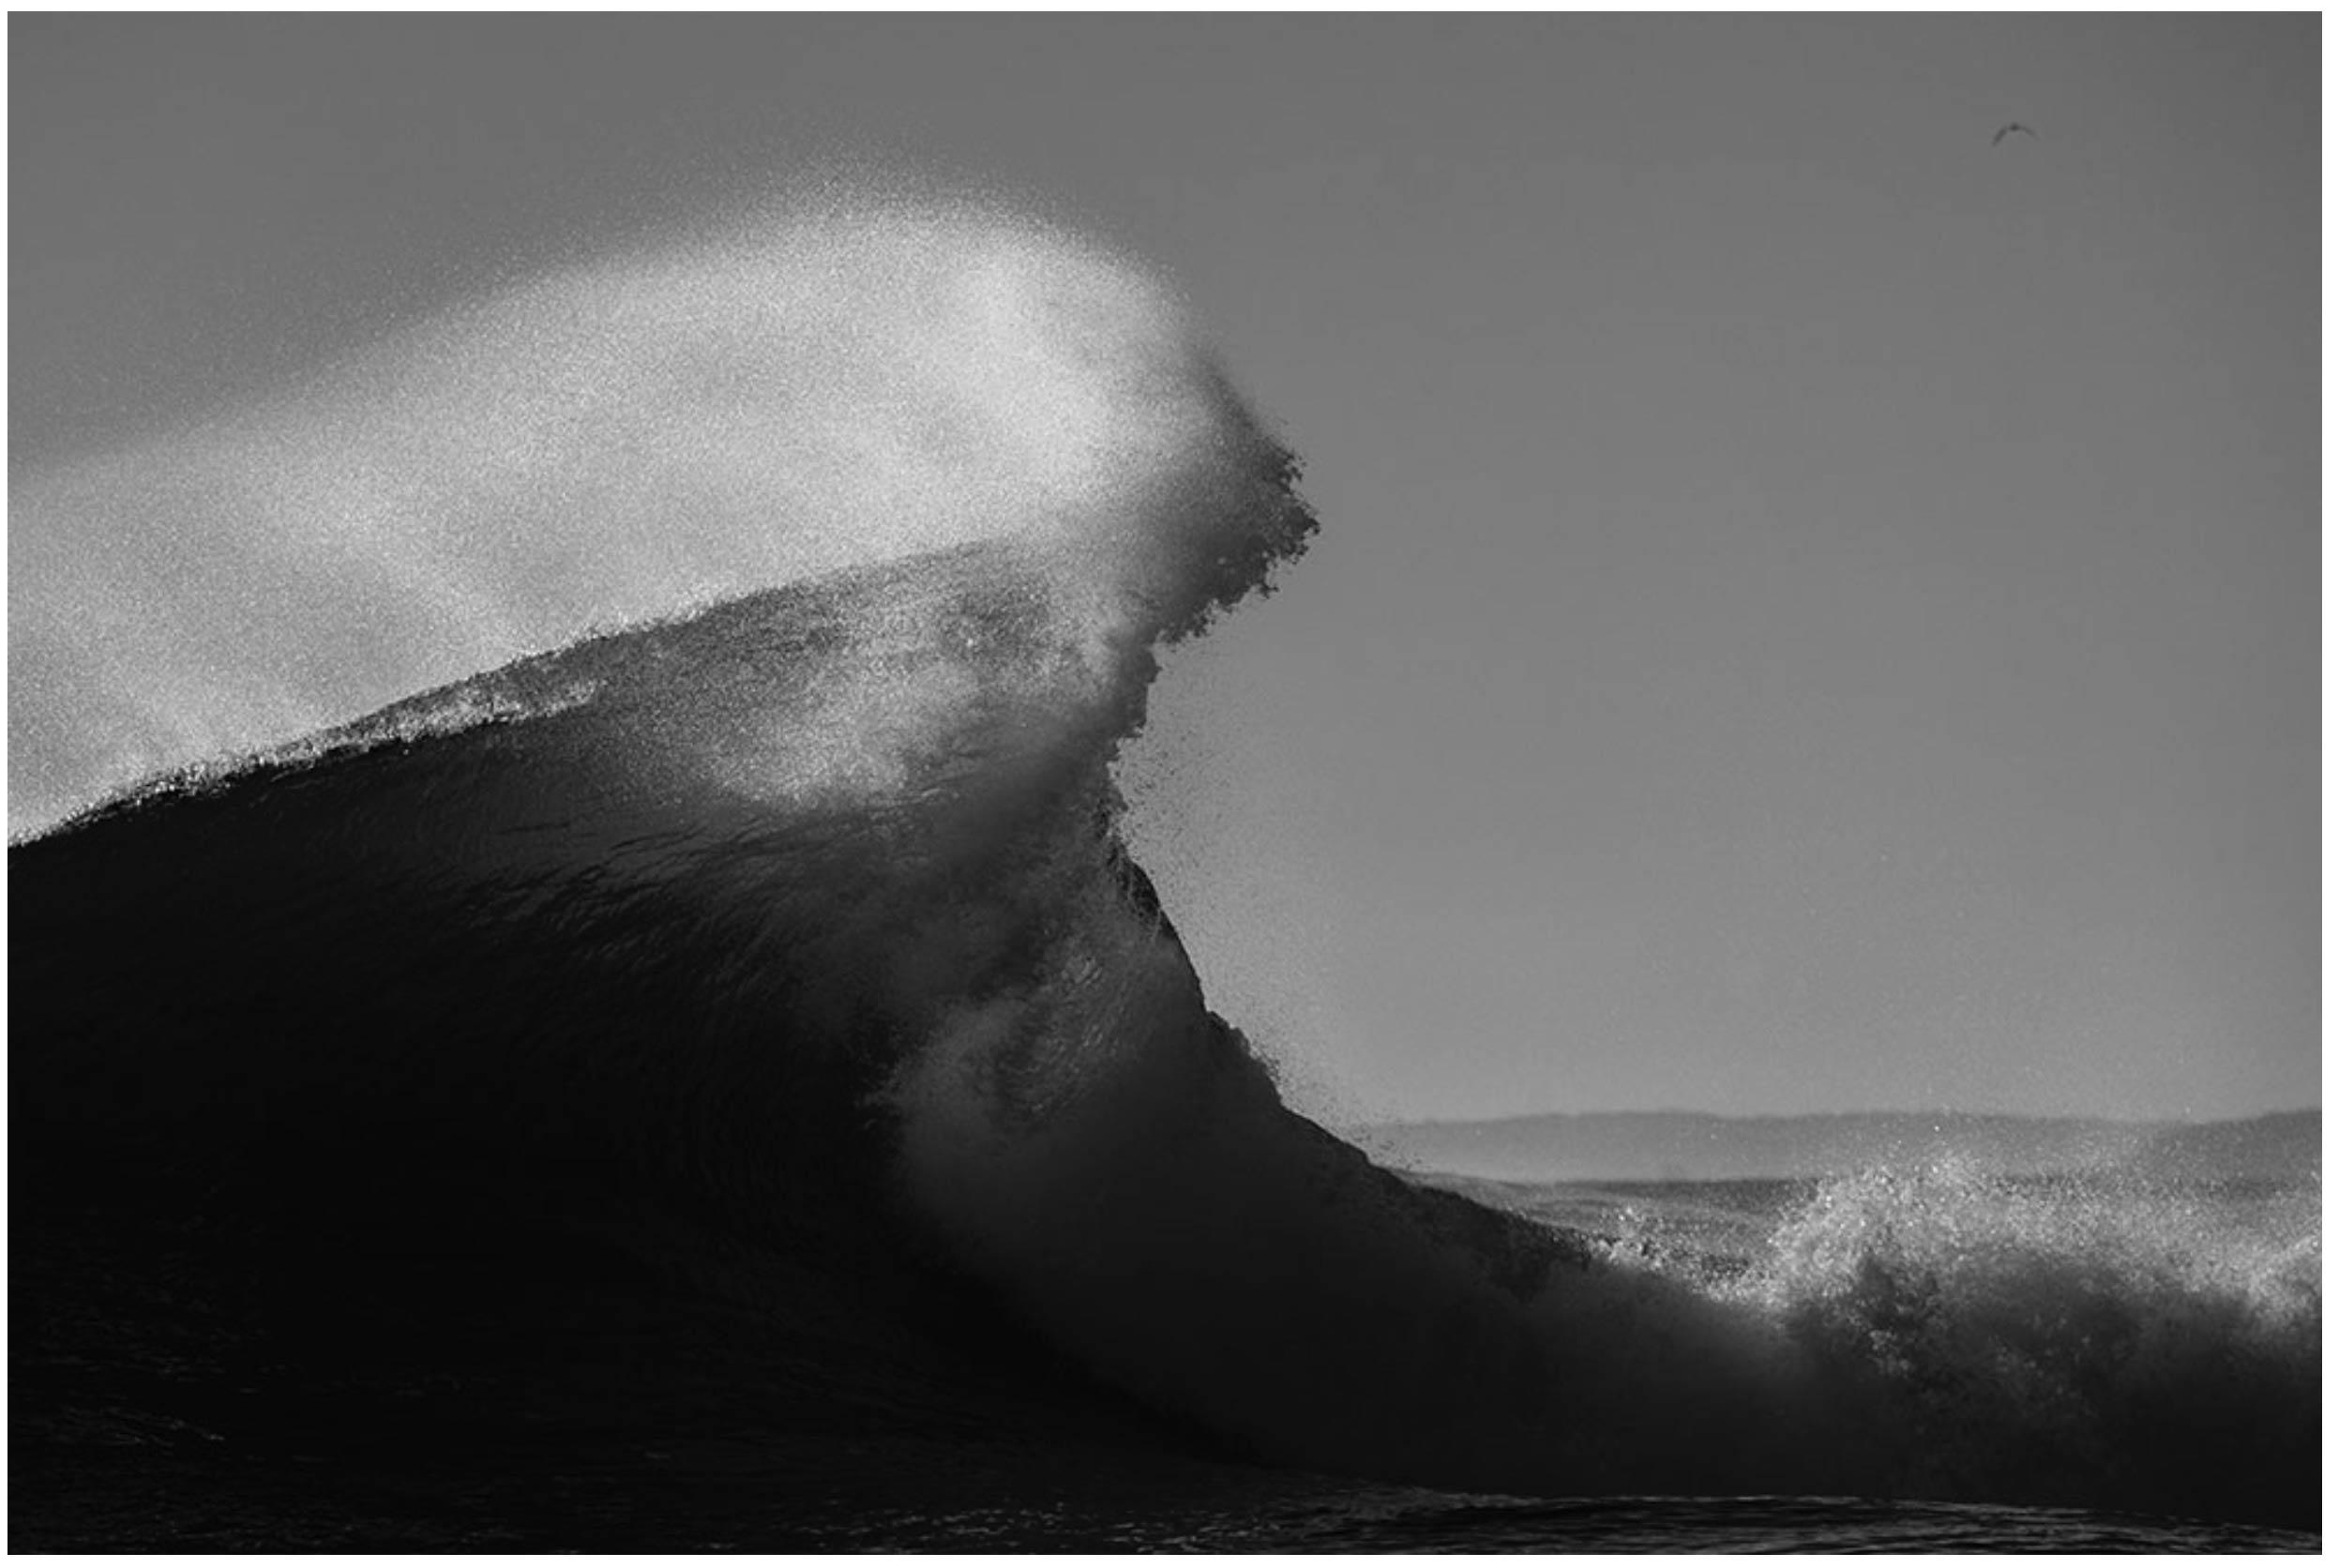 rodd-owen-ocean-surf-photography-for-sale-128.jpg